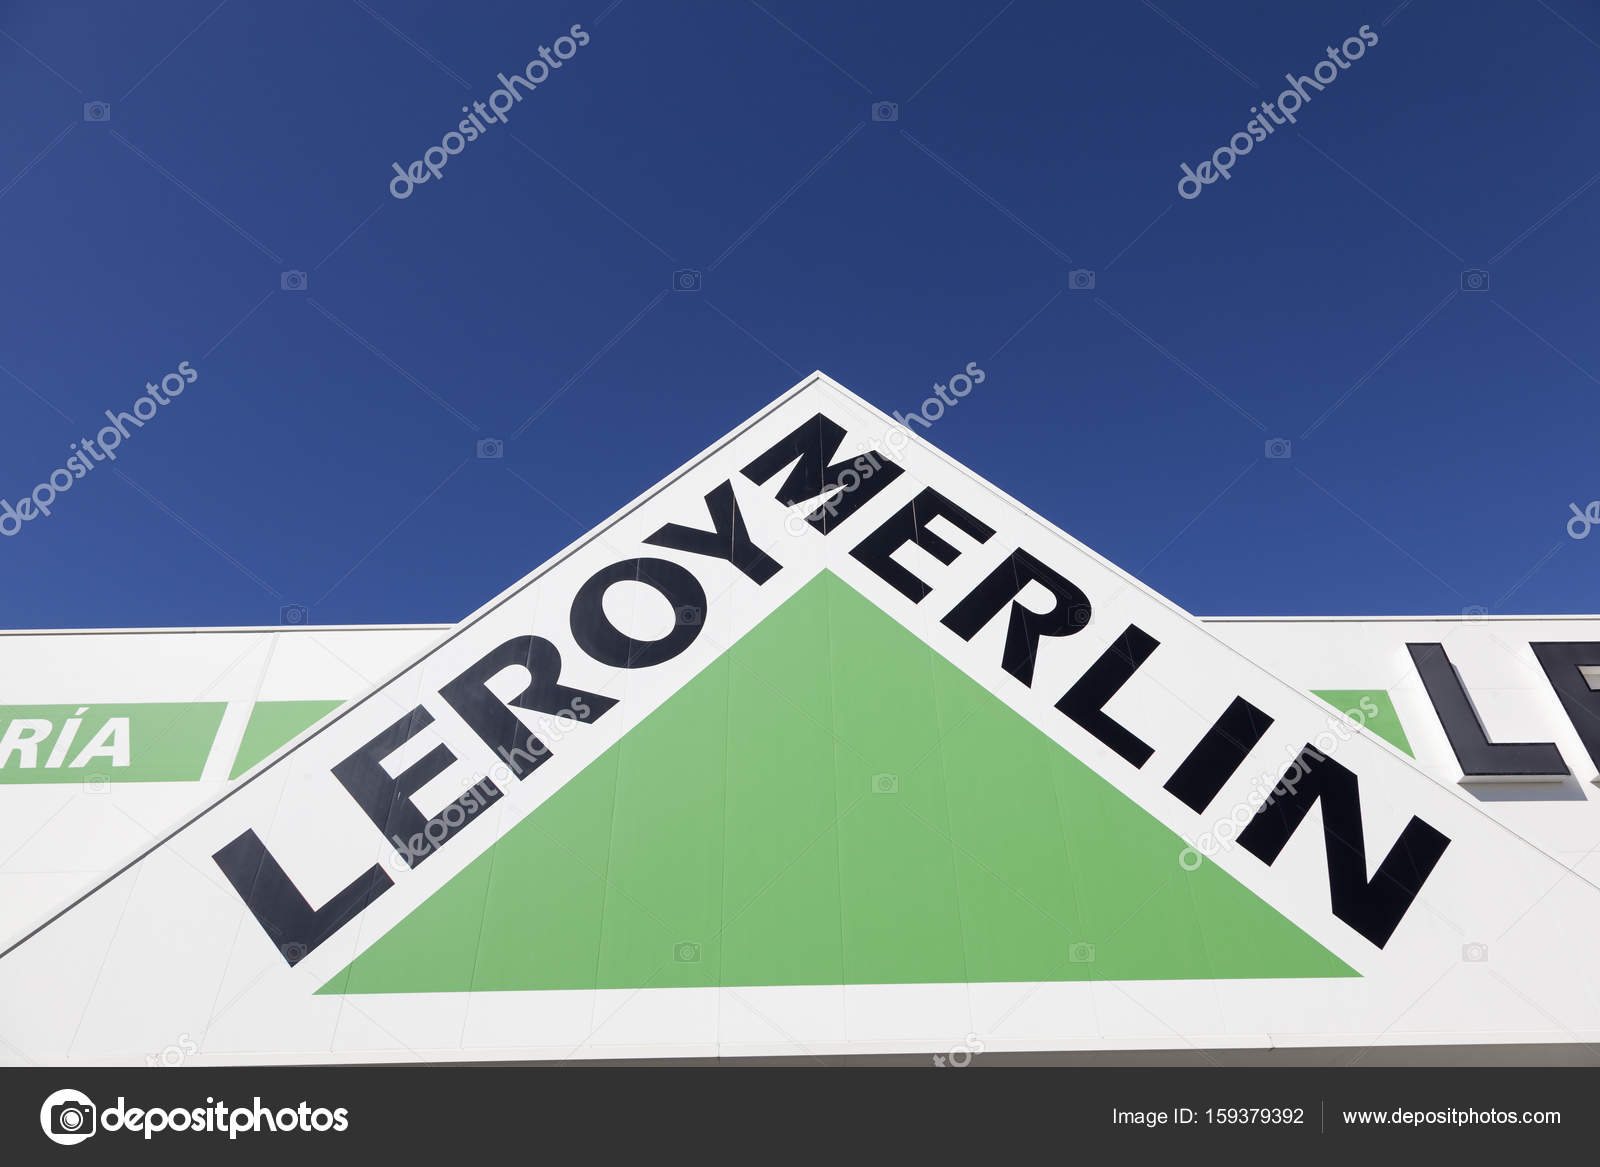 Leroy merlin baumarkt logo u2014 redaktionelles stockfoto © philipus